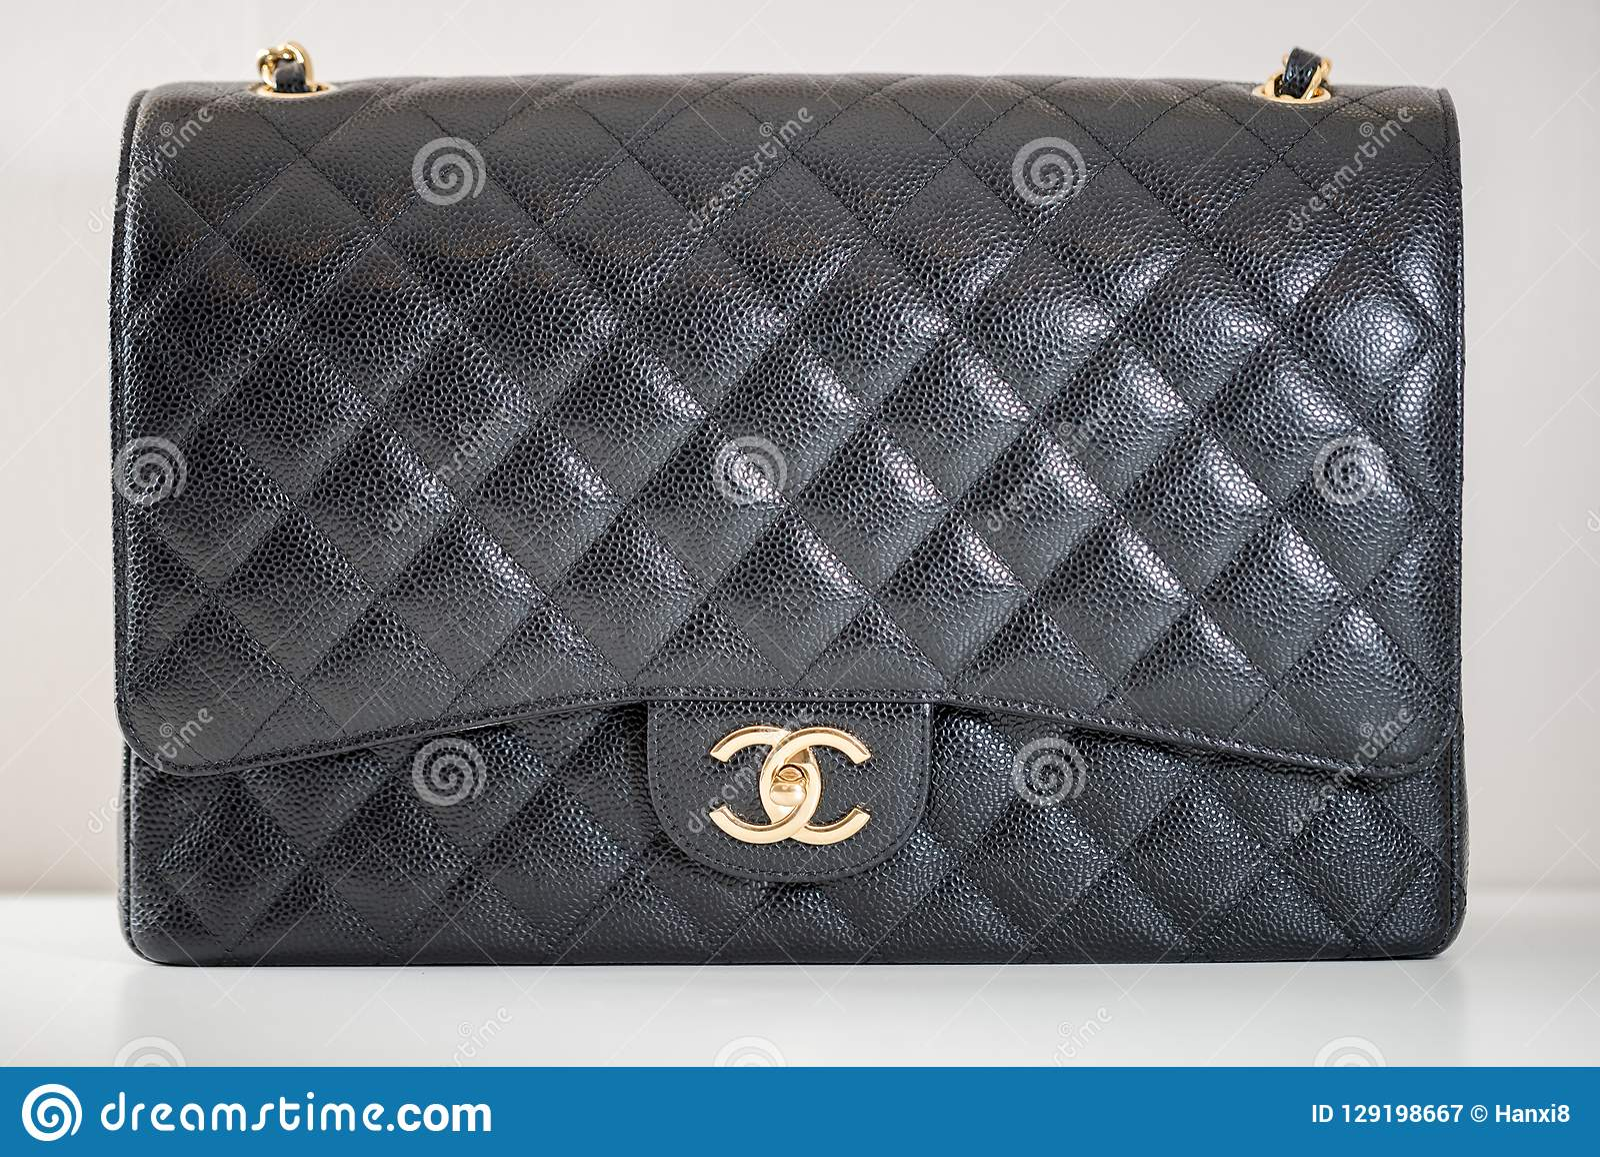 669465481df9 Philadelphia, Pennsylvania, USA, October 18, 2018: Photo of black Chanel  handbag brand Editorial on white background.